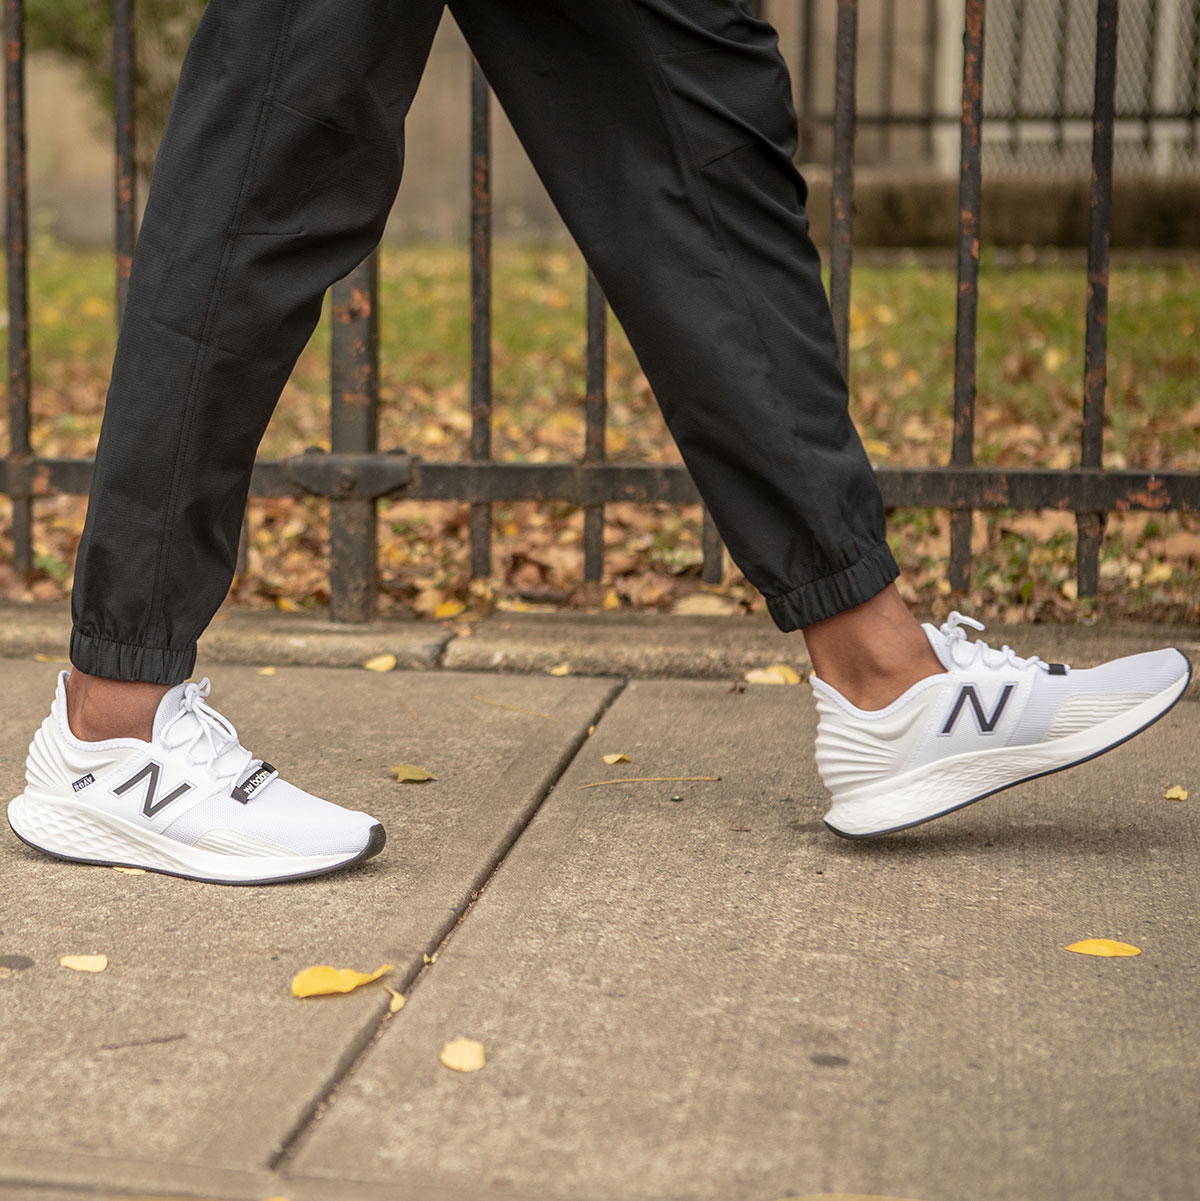 New Balance Shoes \u0026 Sneakers | Rack